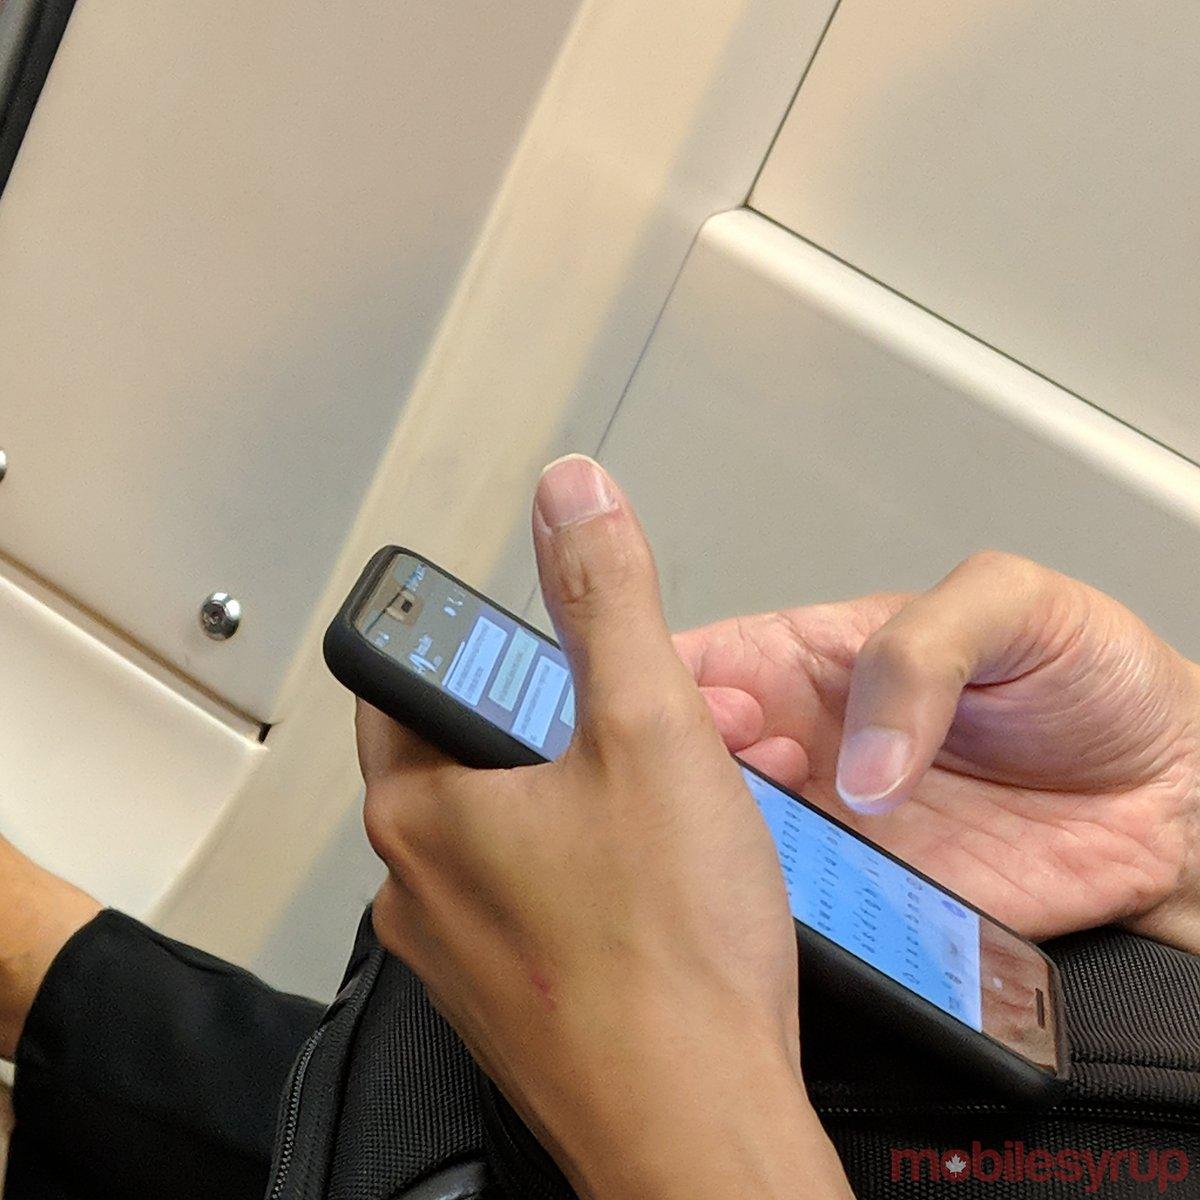 Новый флагманский смартфон Google замечен в трамвае в Торонто